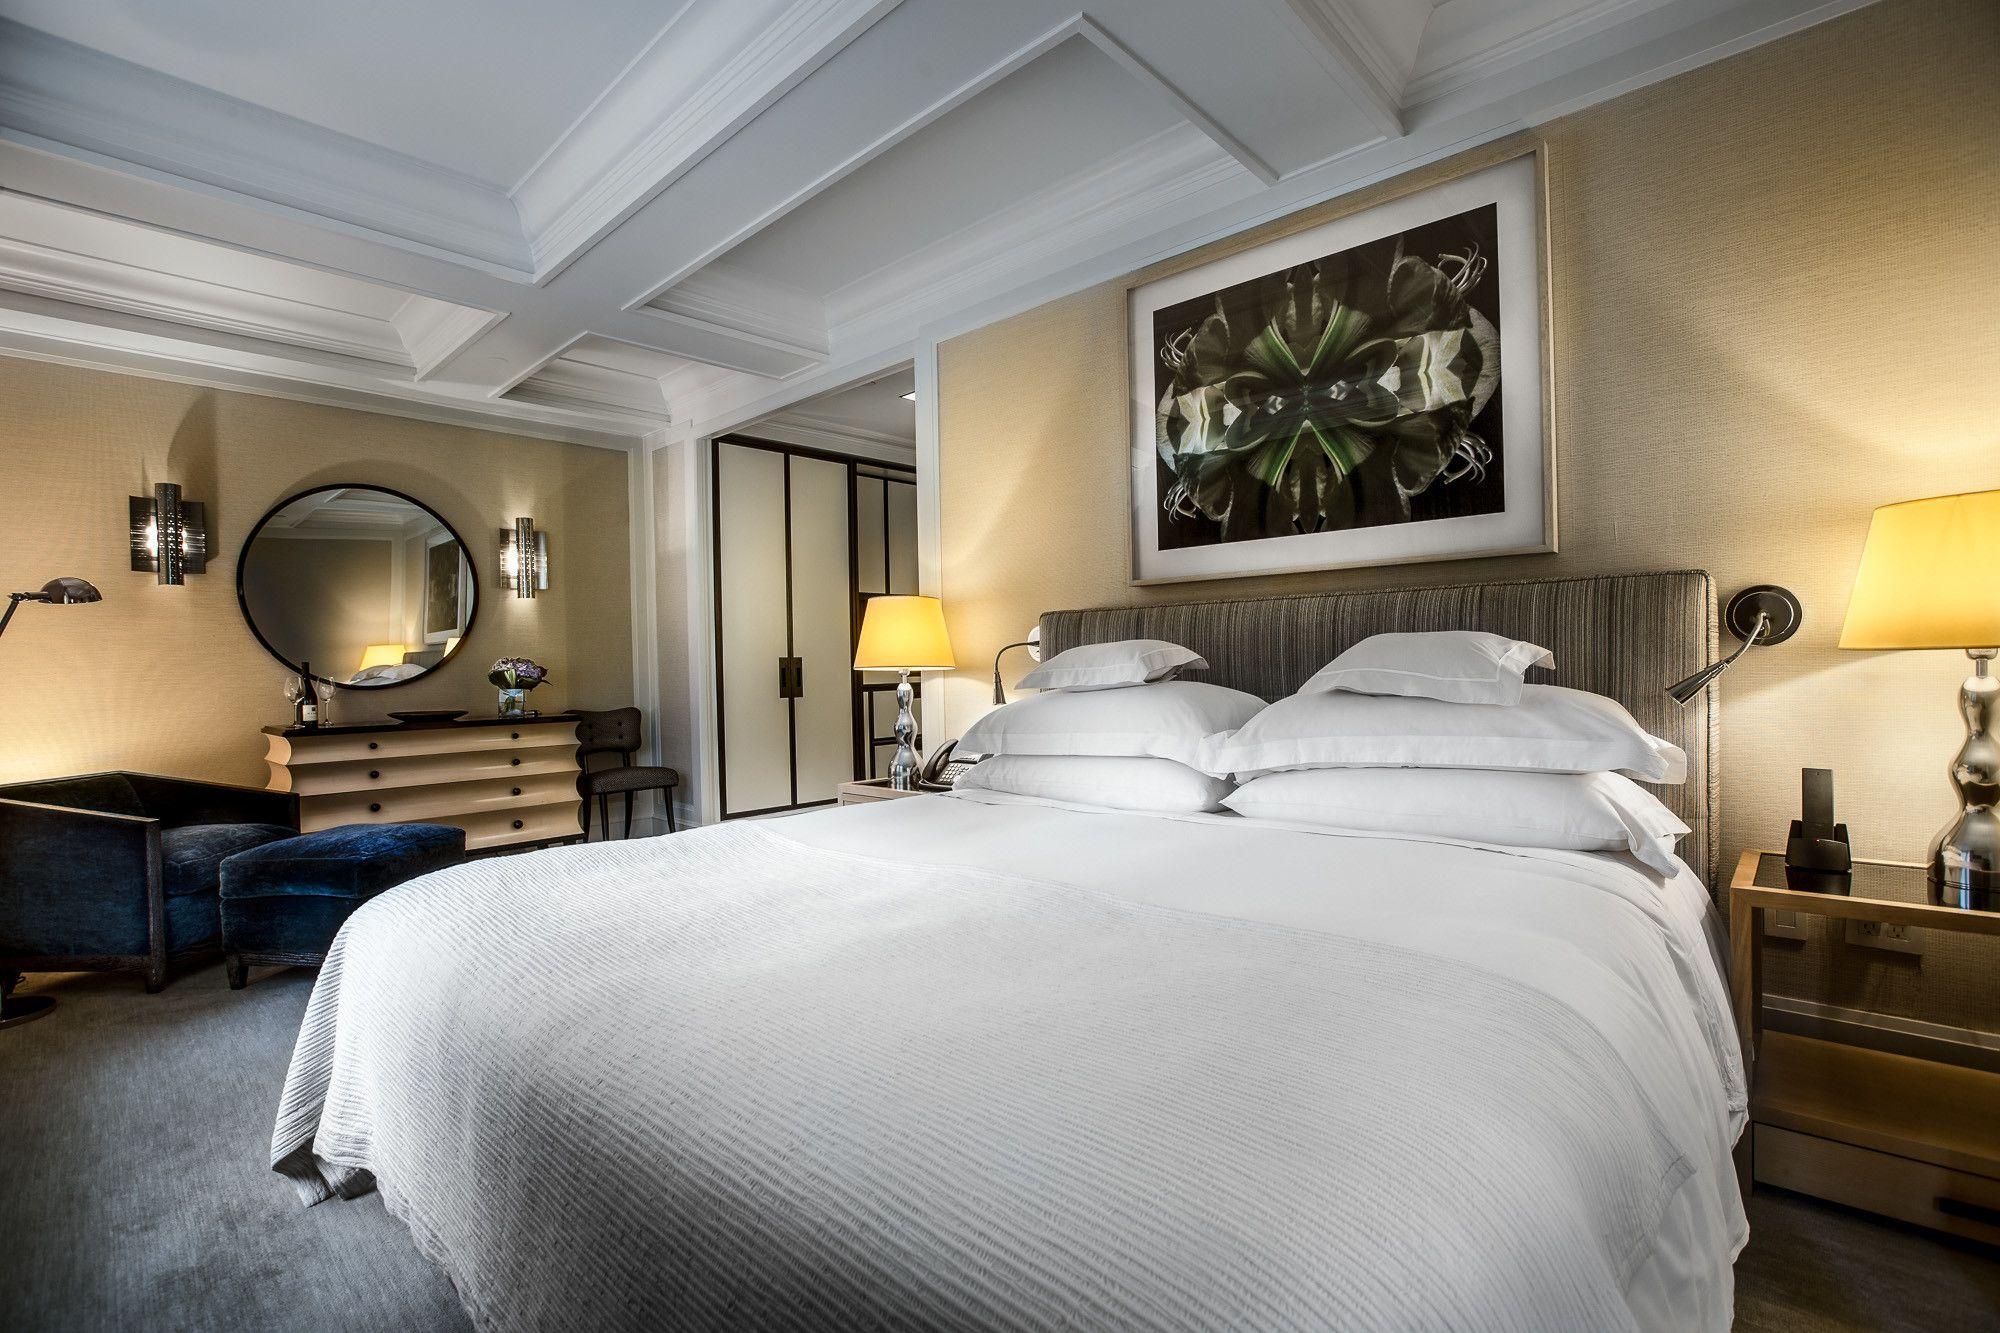 Hotels Manhattan New York Manhattan Hotels New York Hotels